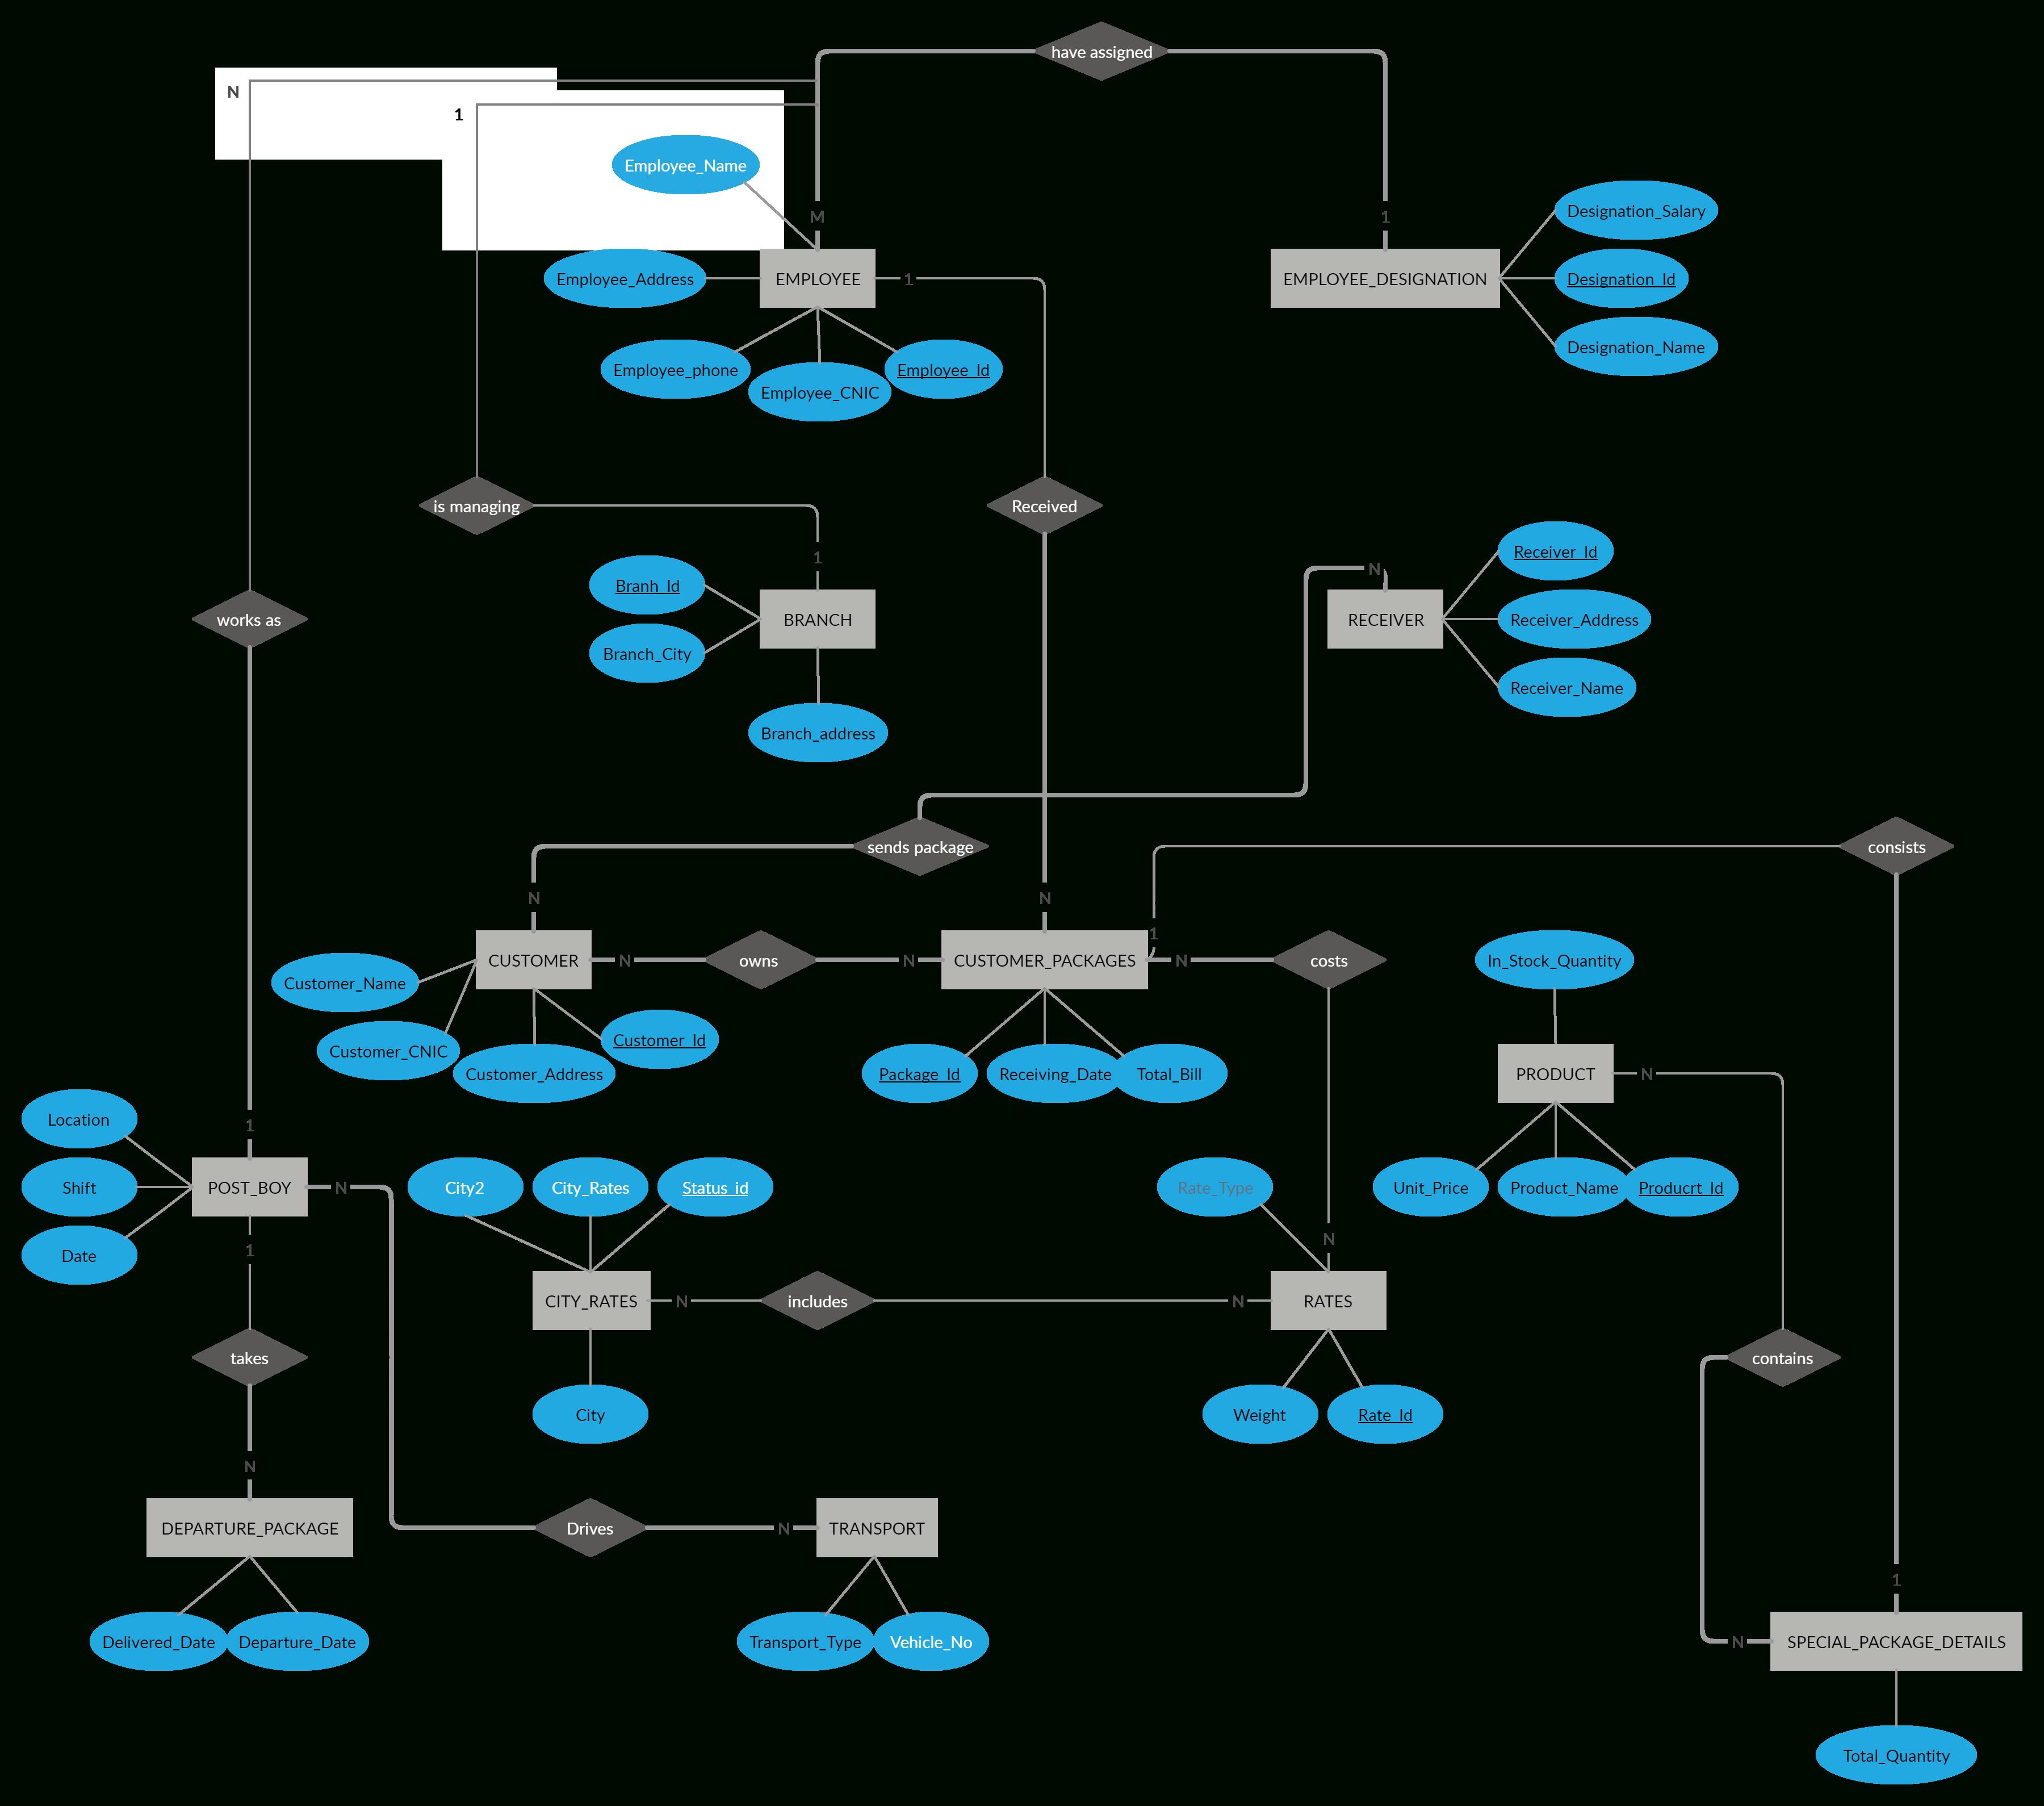 Courier Service   Relationship Diagram, Courier Service